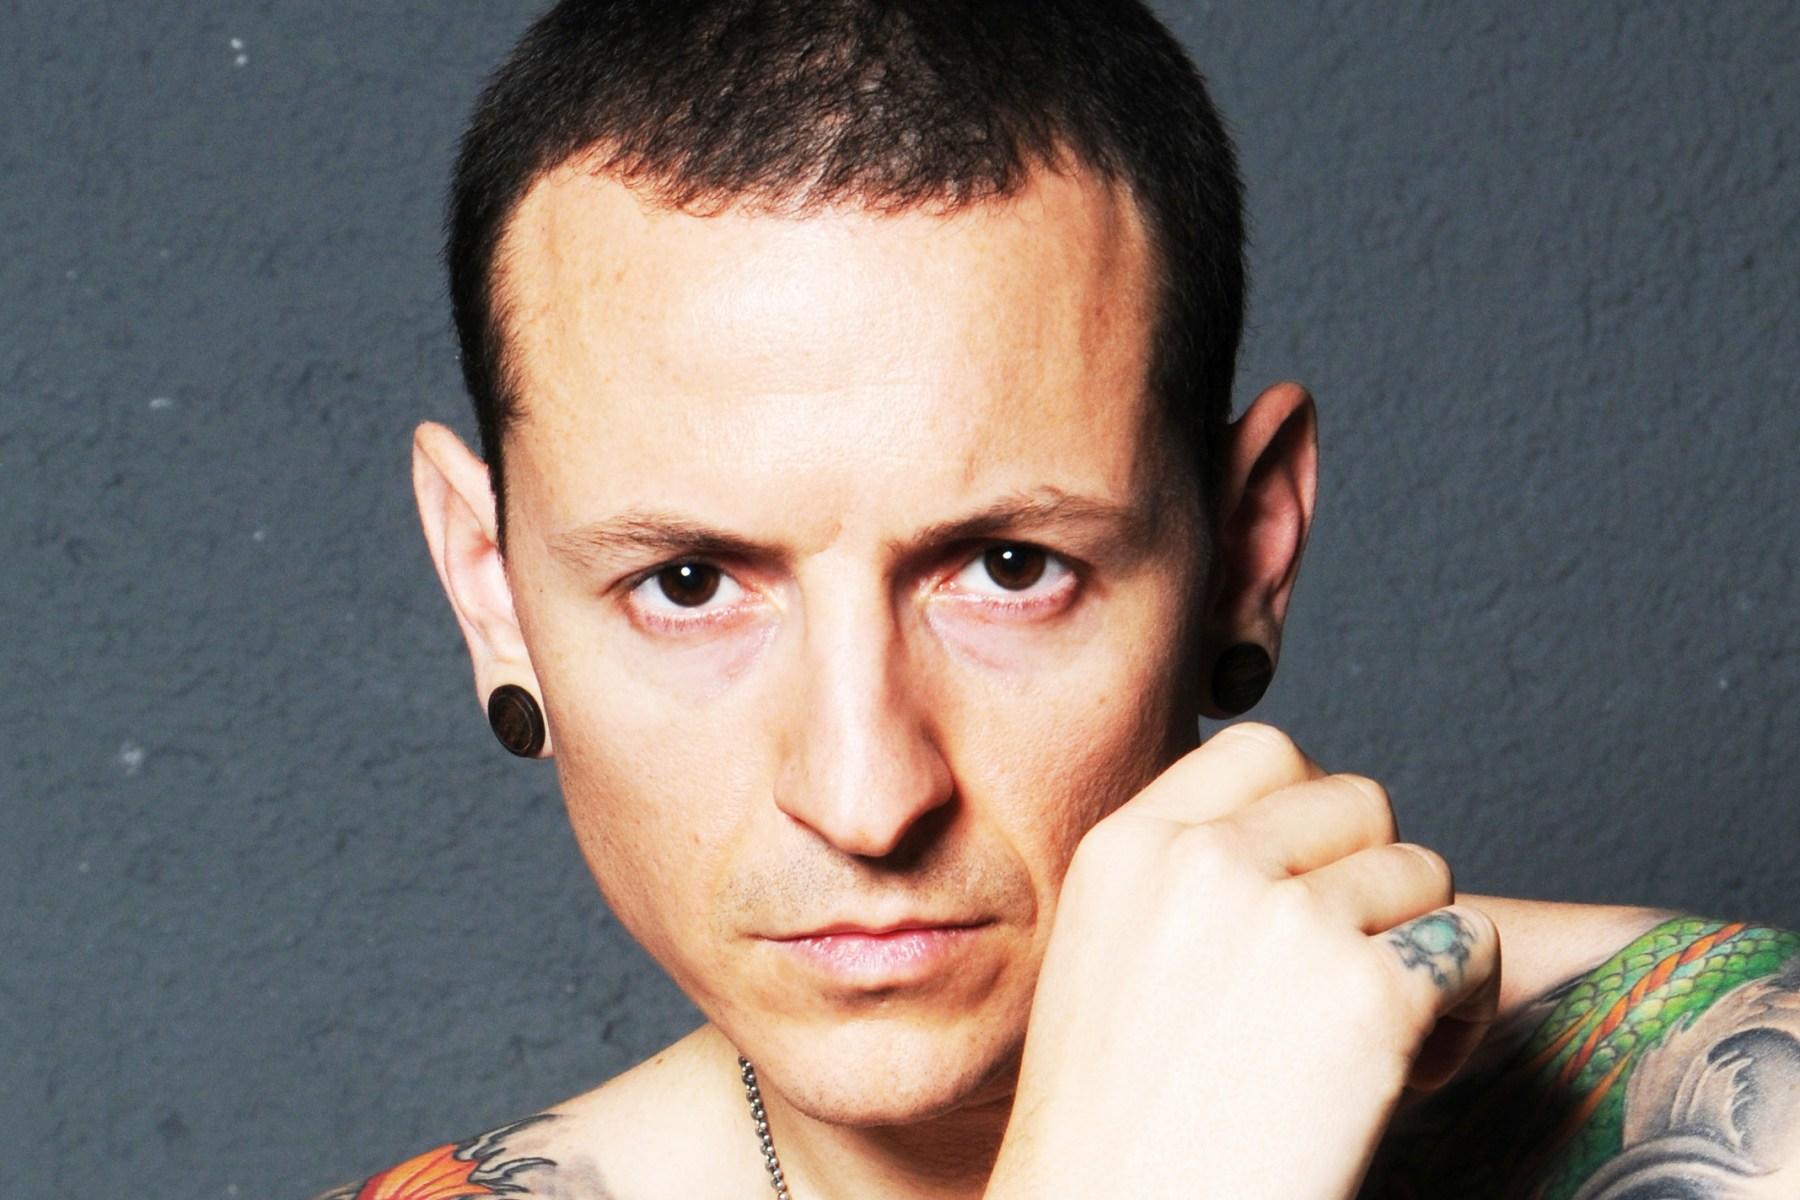 Chester Bennington's Last Days: Linkin Park Singer's Mix of Hope, Heaviness